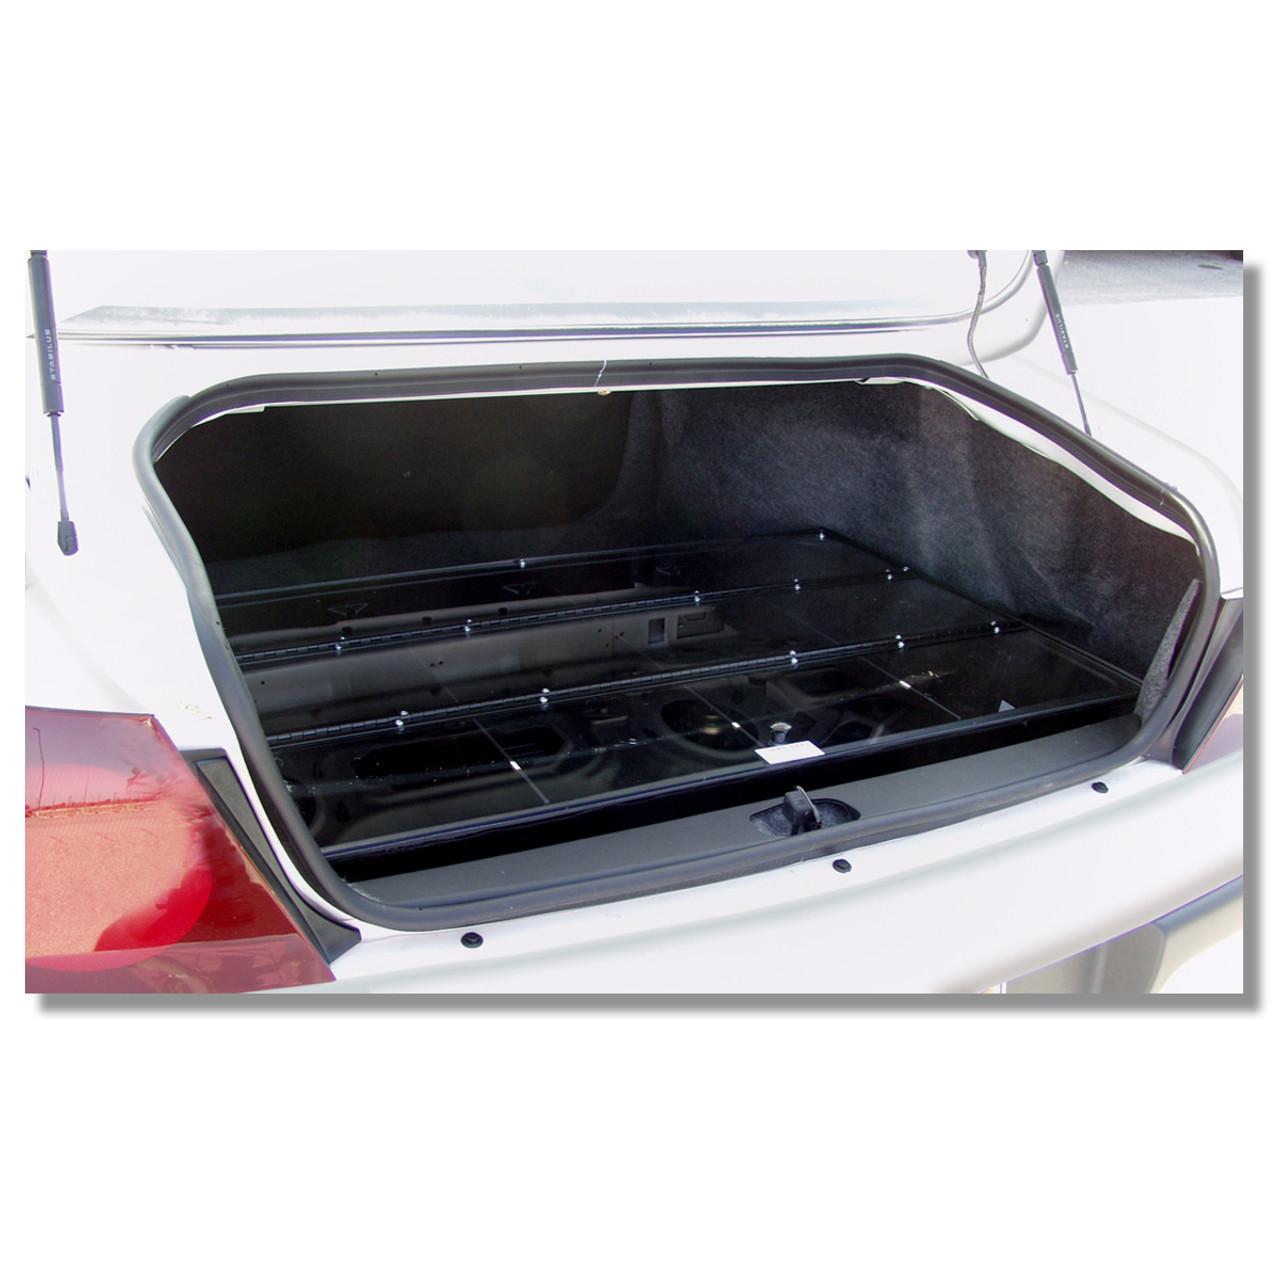 Chevy Impala 2006+ Police Gear Equipment Trunk Organizer by Progard